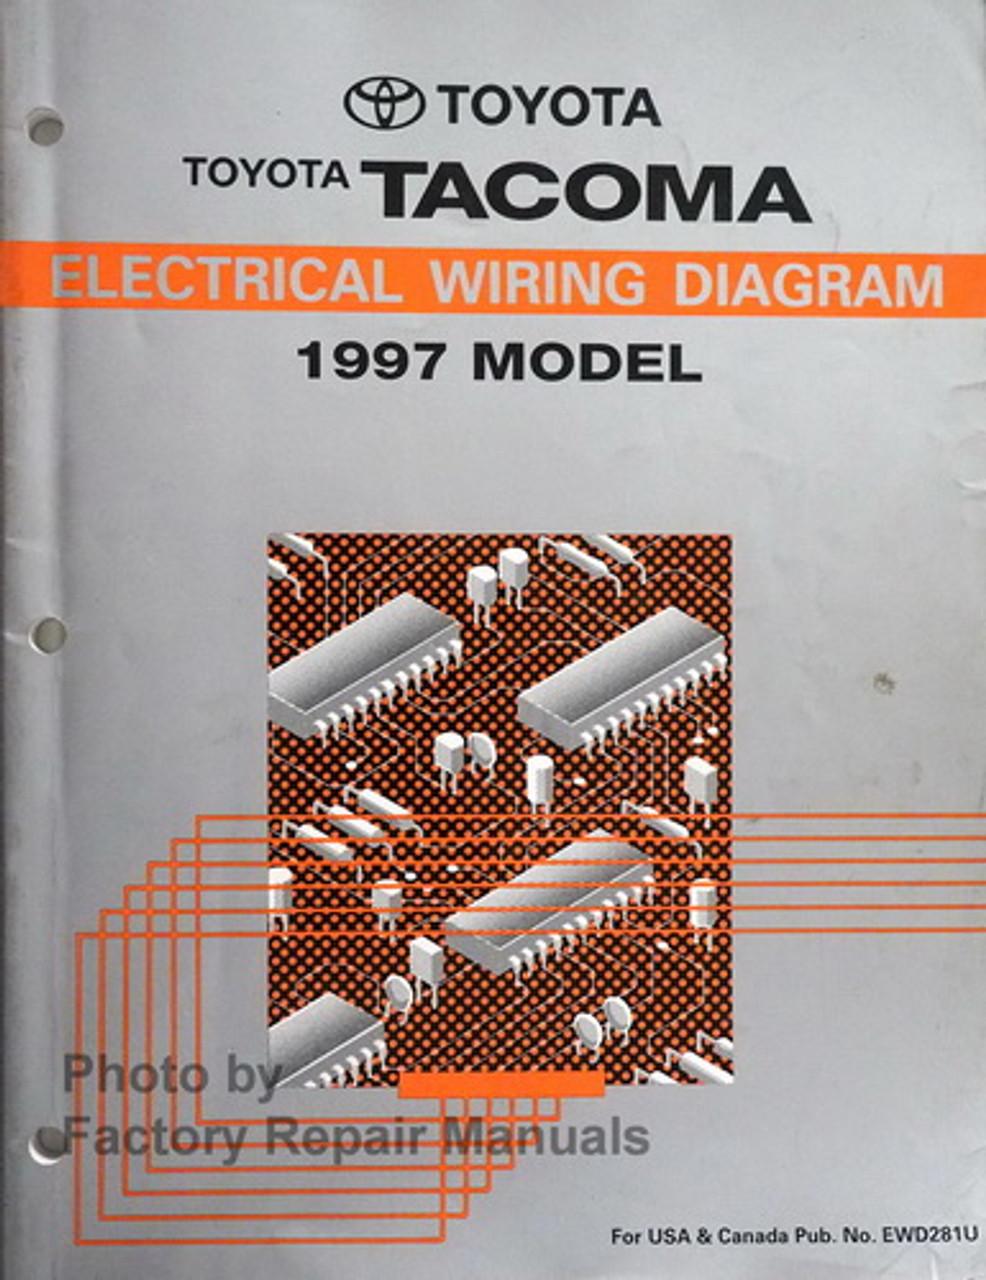 1997 Toyota Tacoma Electrical Wiring Diagrams Original Factory Manual -  Factory Repair Manuals | 1997 Toyota Tacoma Wiring Diagram |  | Factory Repair Manuals